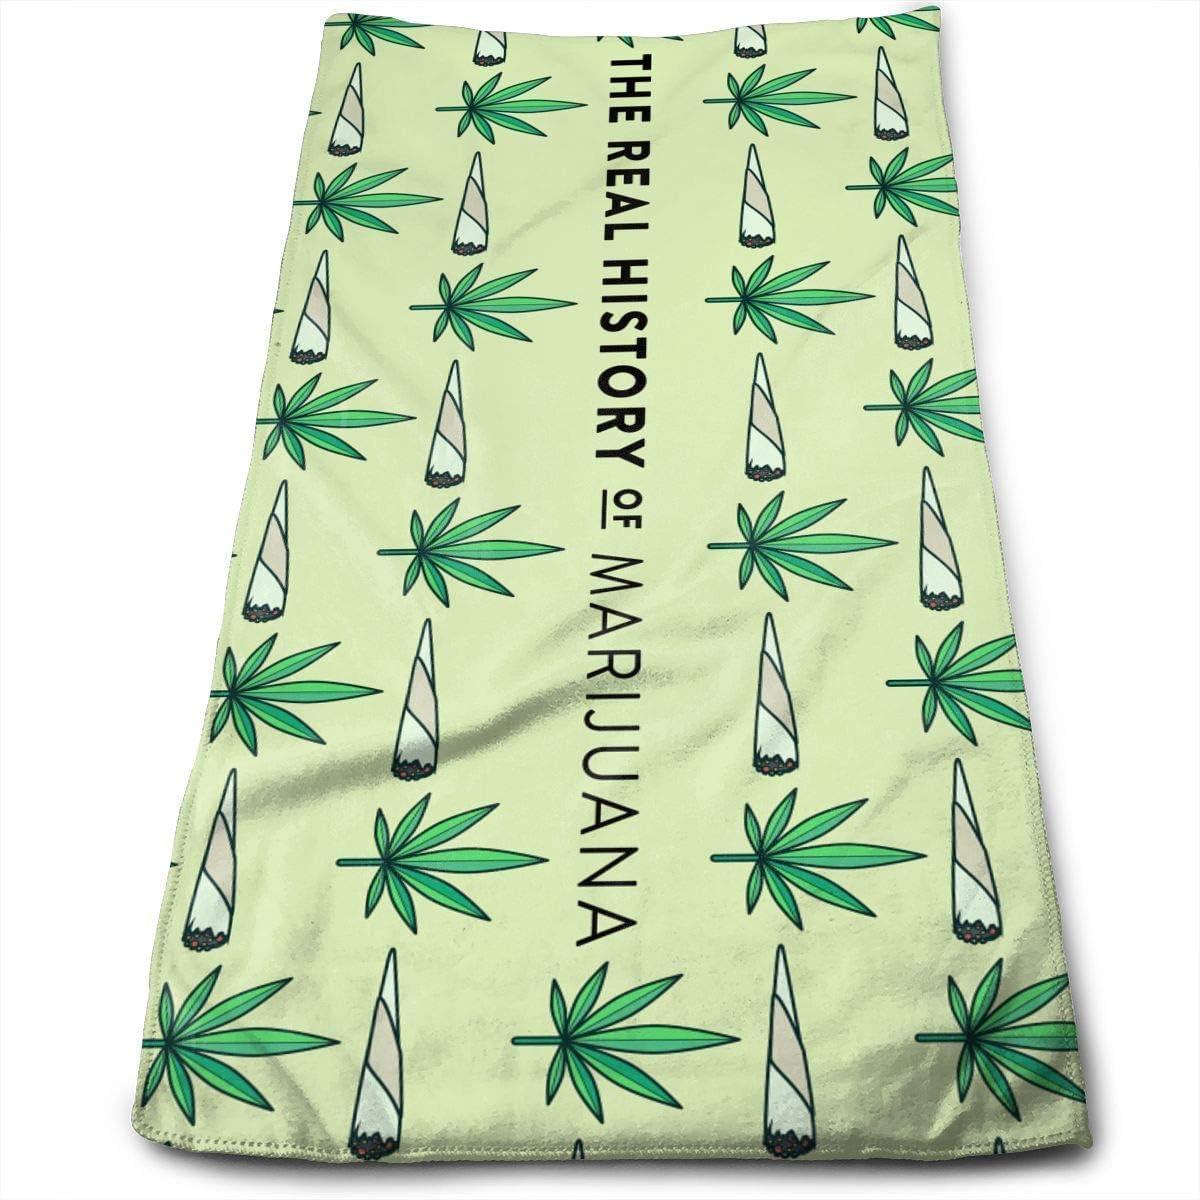 huibe Microfibra de Marihuana Toallas limpias Toallas para el Rostro Secado rápido Toallas para el Cabello para baño, SPA, Gimnasio 30x70 cm Sport Workout Toallas para Autos